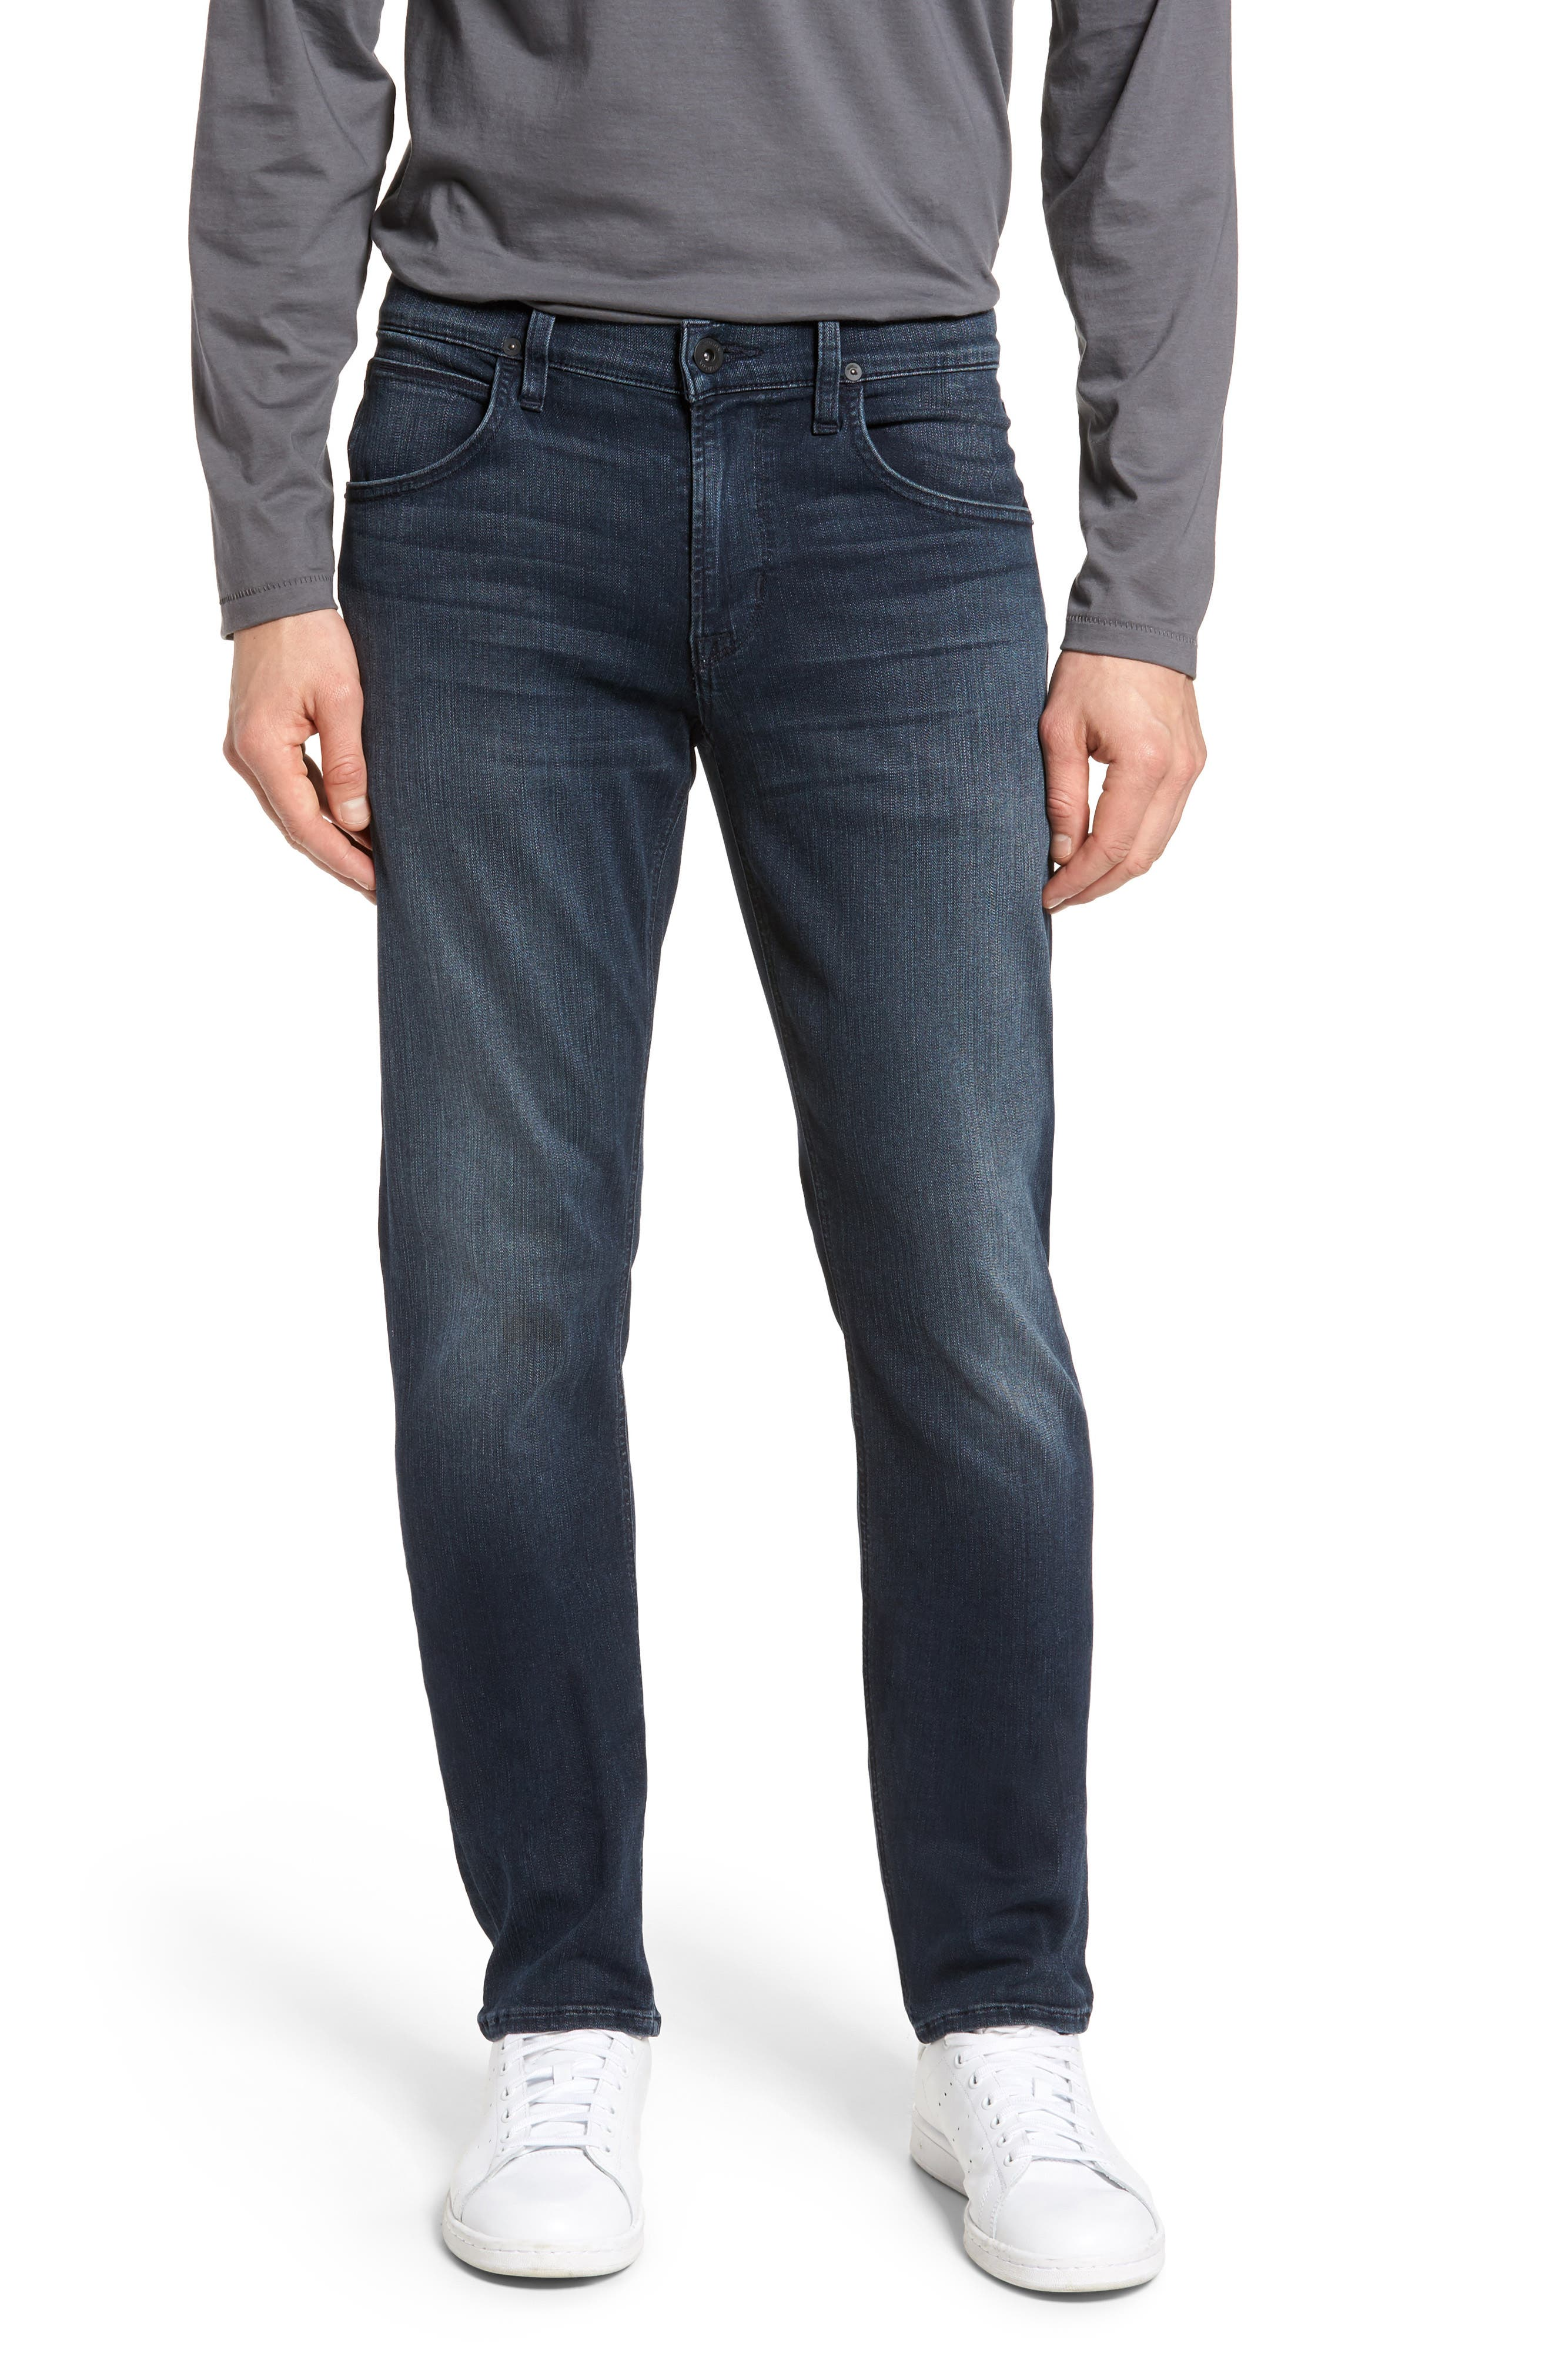 Blake Slim Fit Jeans,                         Main,                         color, Hallows